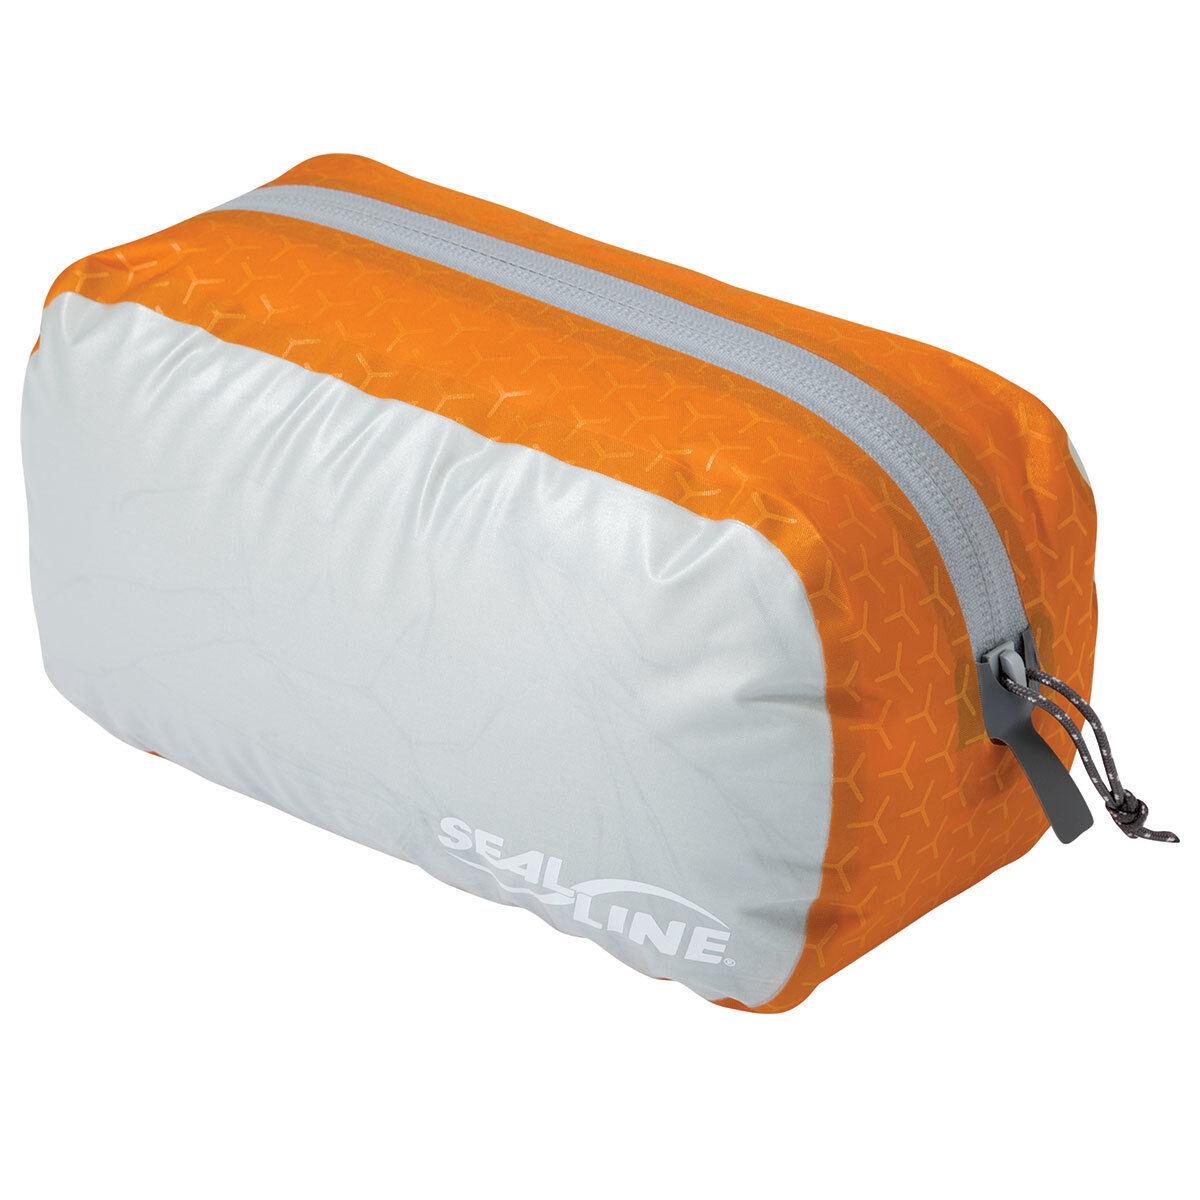 Sealline Blocker Zip Sack, Medium